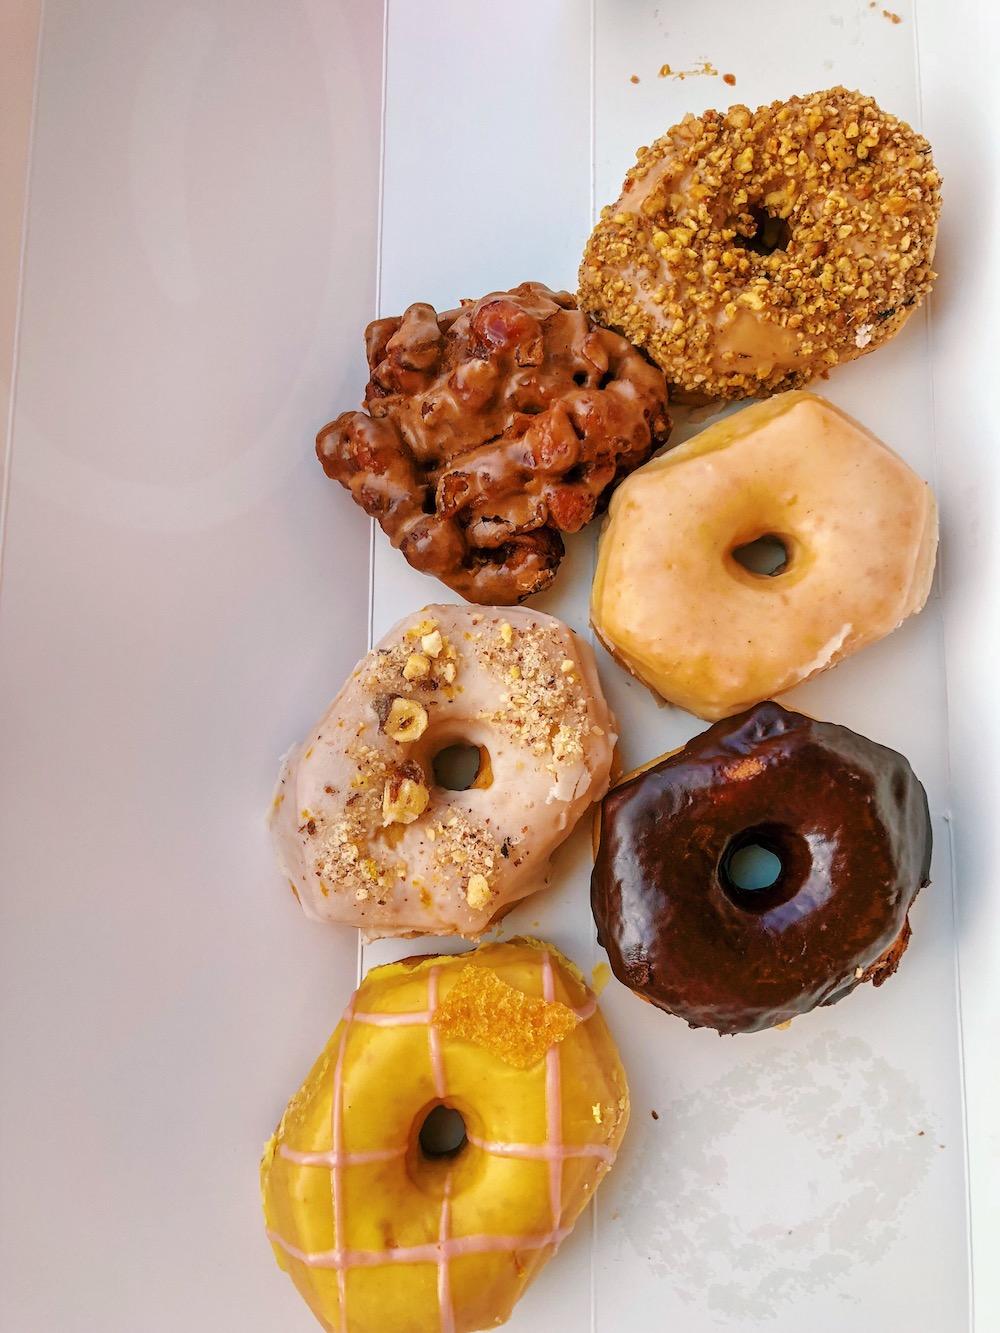 Apple Fritter, Candied Nut and Orange, Citrus Glaze, Smokes Maple Walnut, Vanilla Glaze, Chocolate Glaze from   CARTEMS